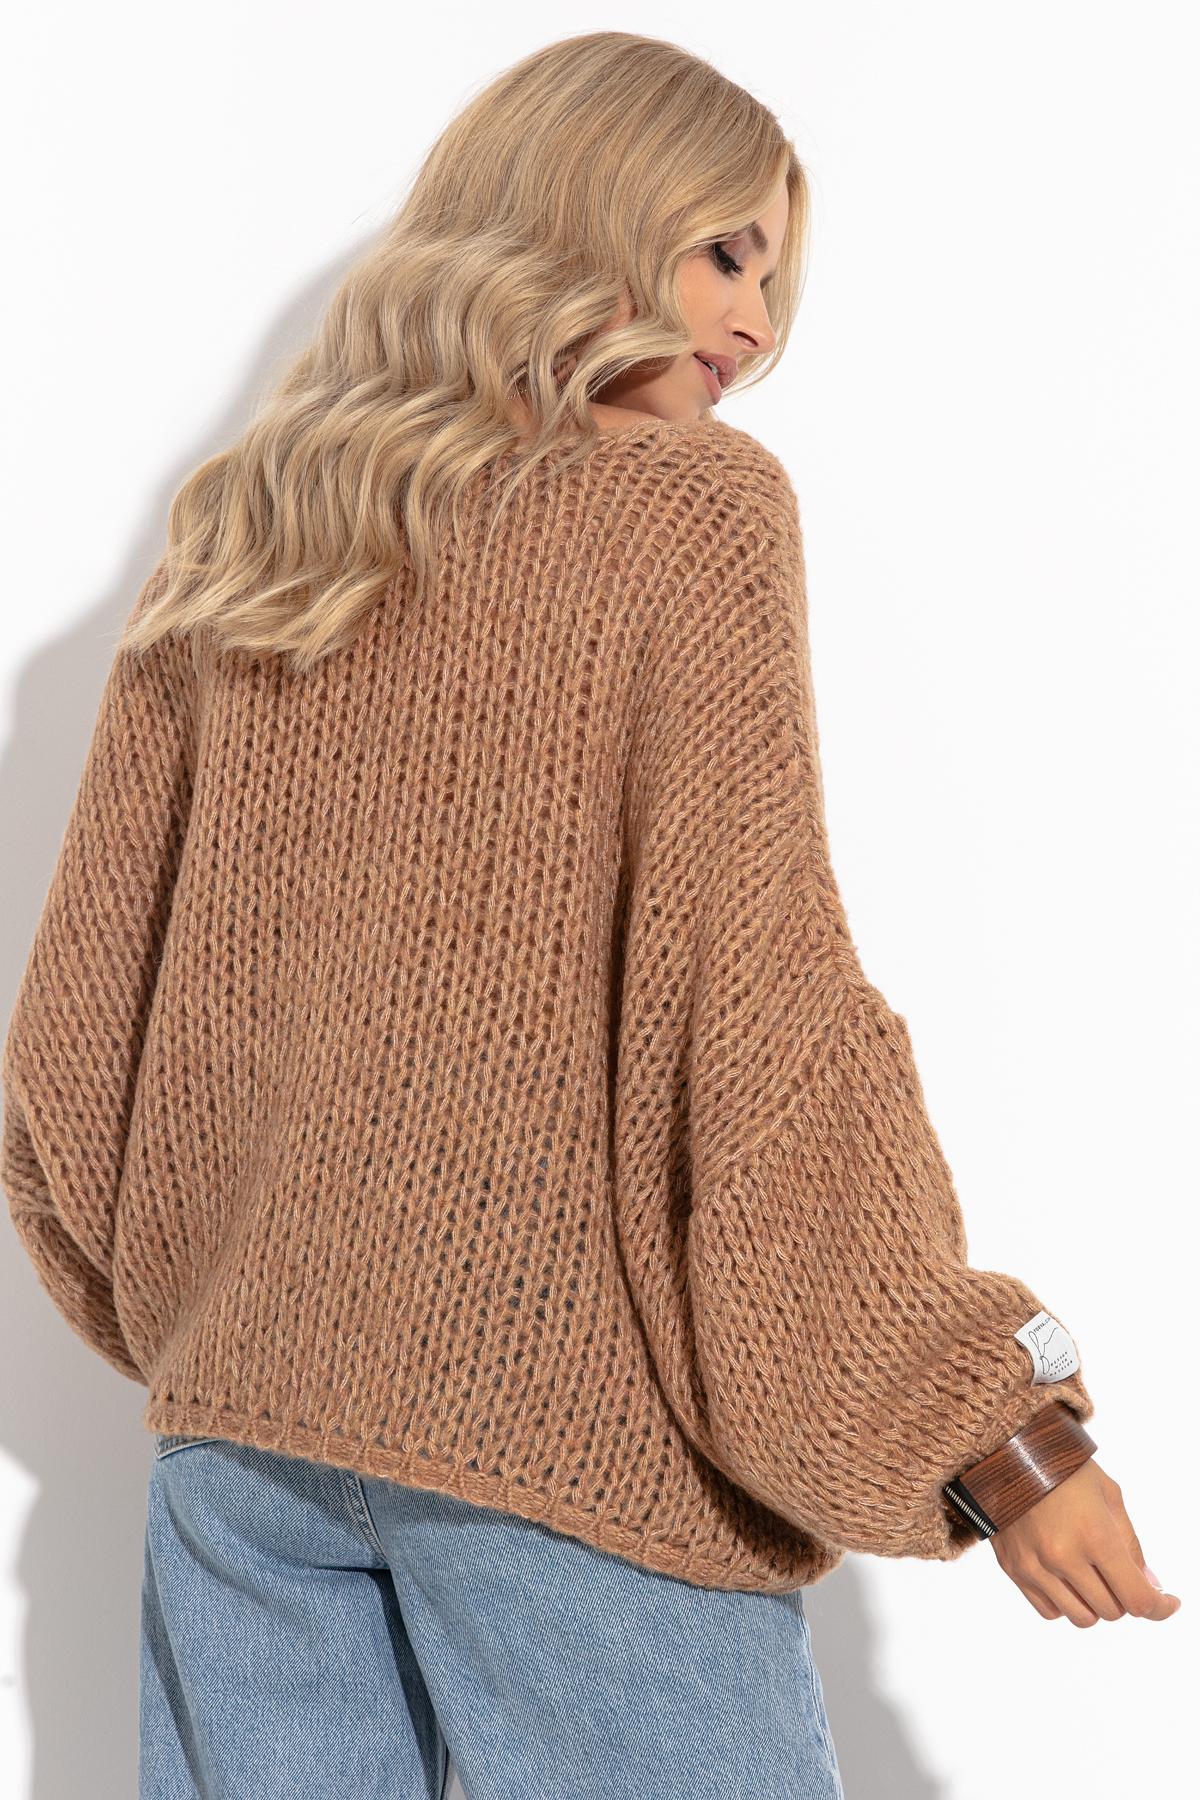 Pullover mit V-Ausschnitt in Camel Rückansicht